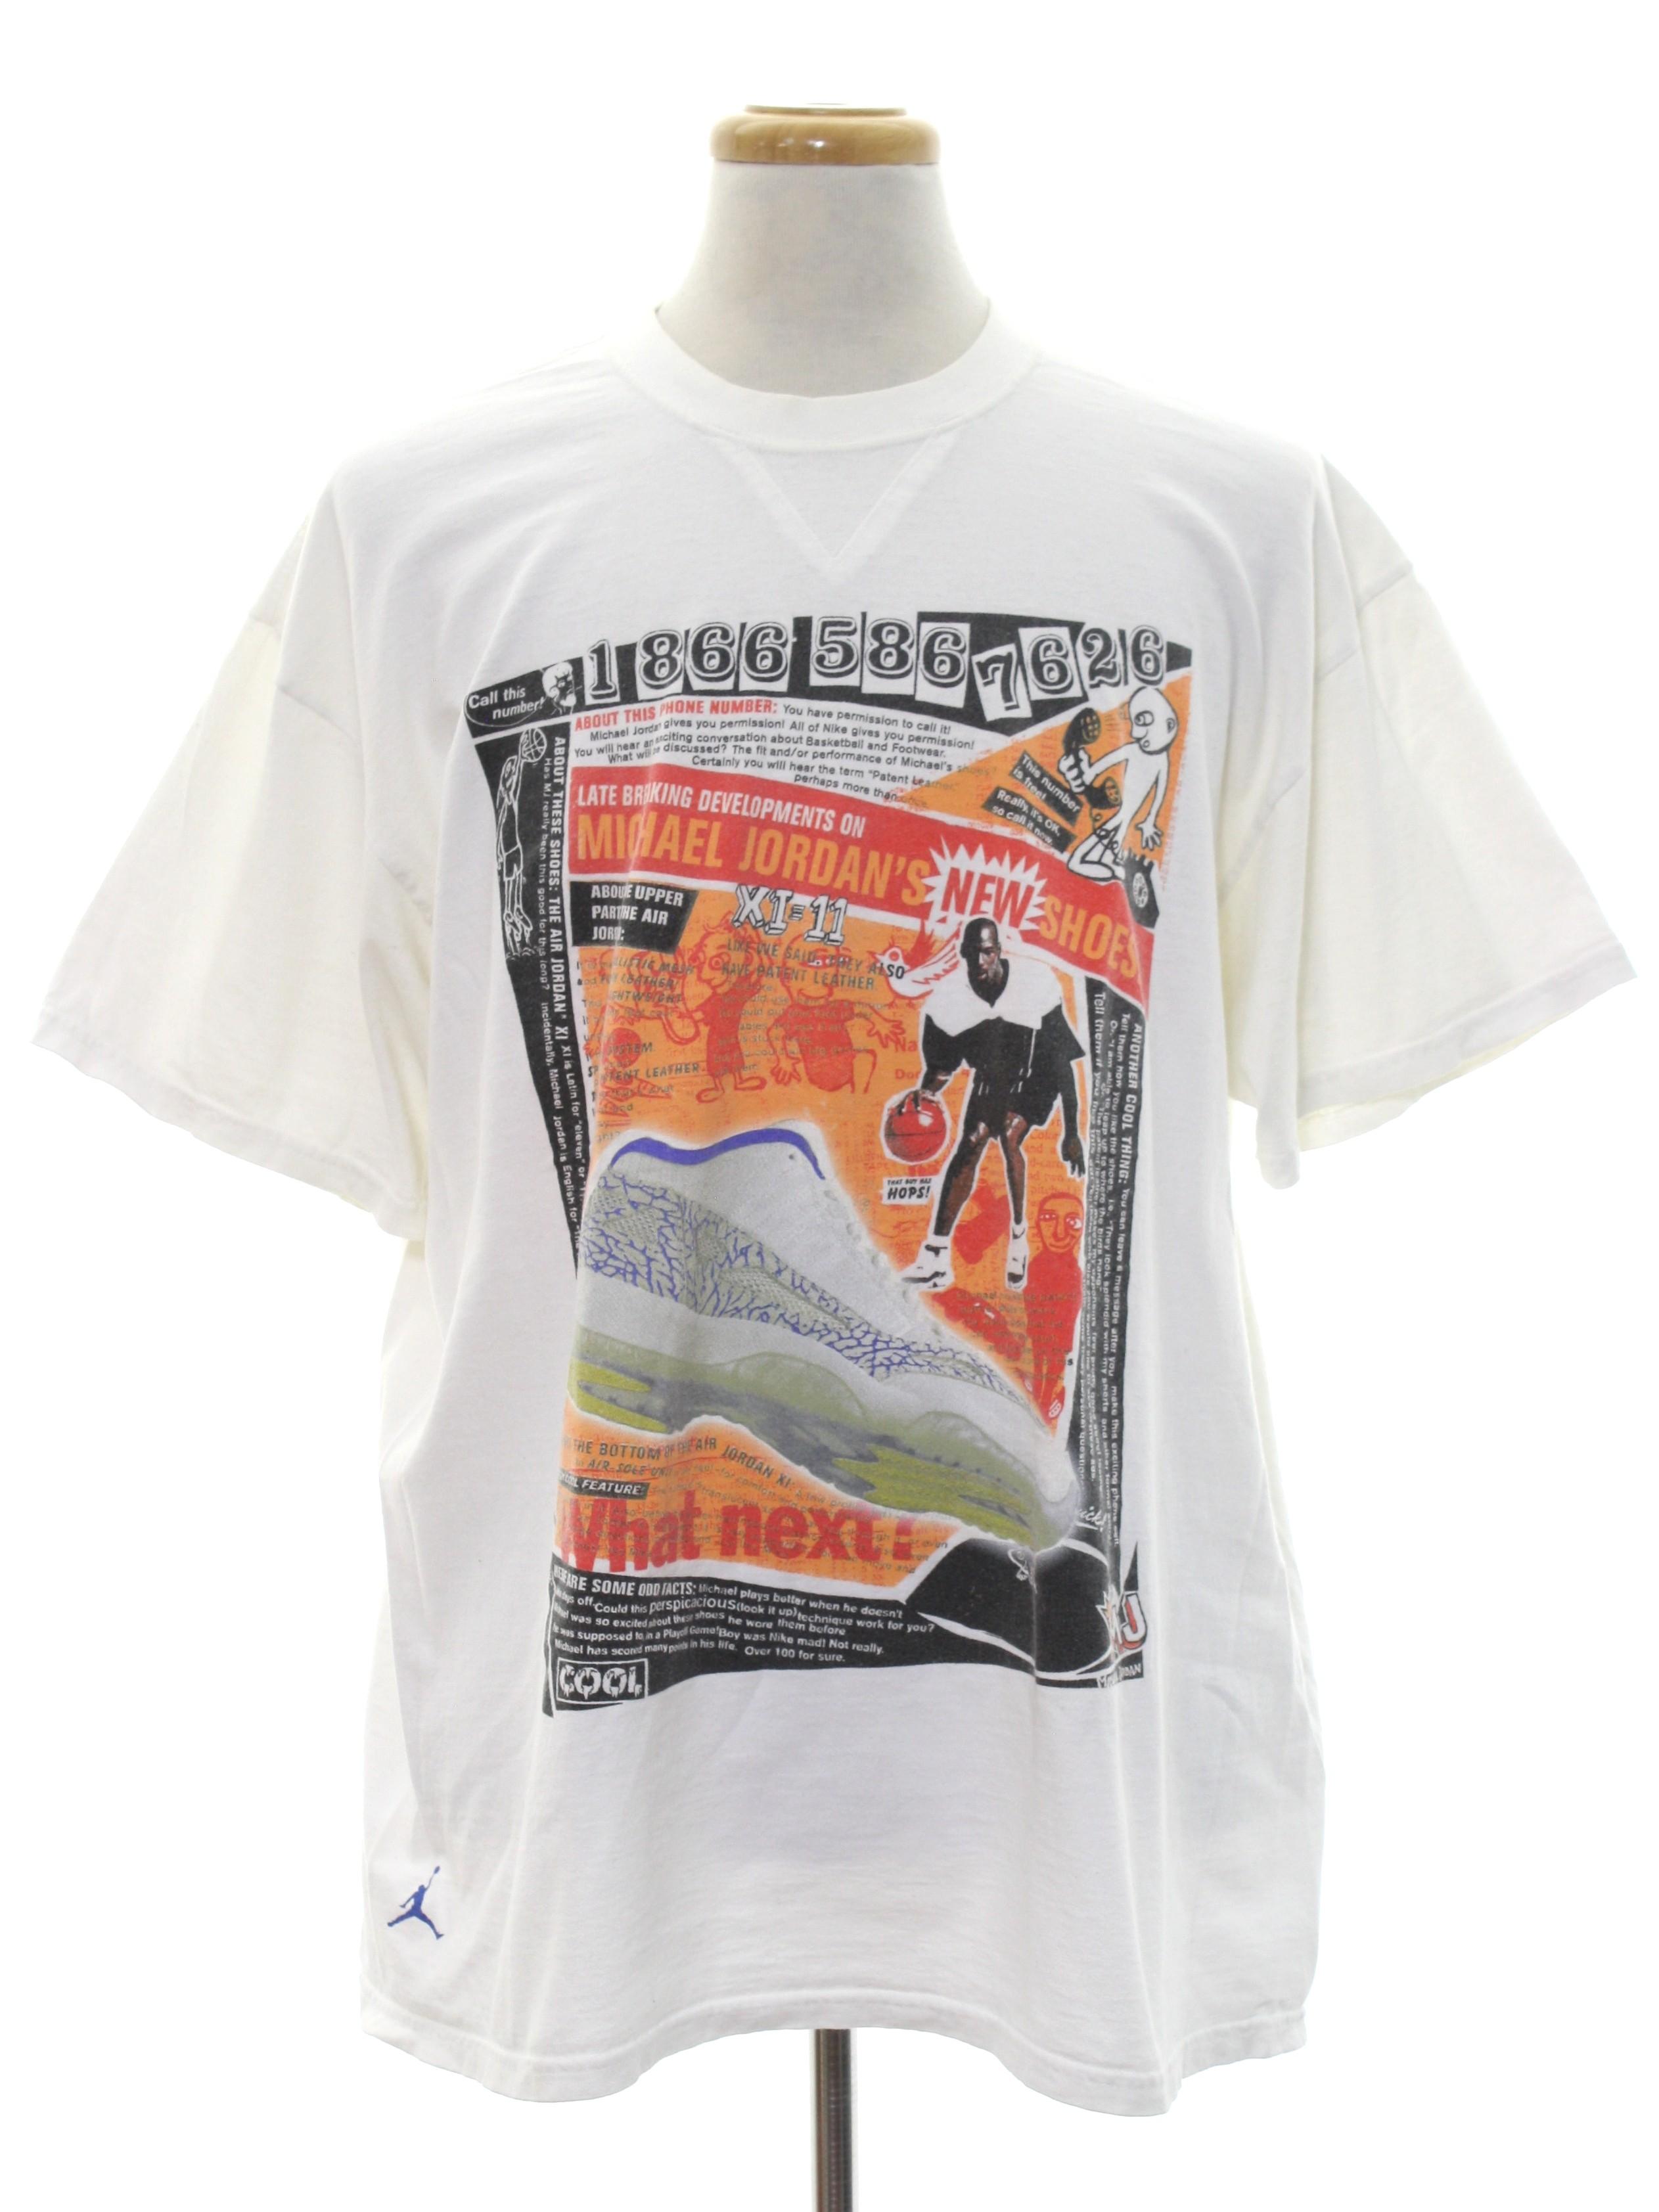 5f1f5e9994581f Retro 1990 s T Shirt (Nike)   90s -Nike- Unisex white background ...